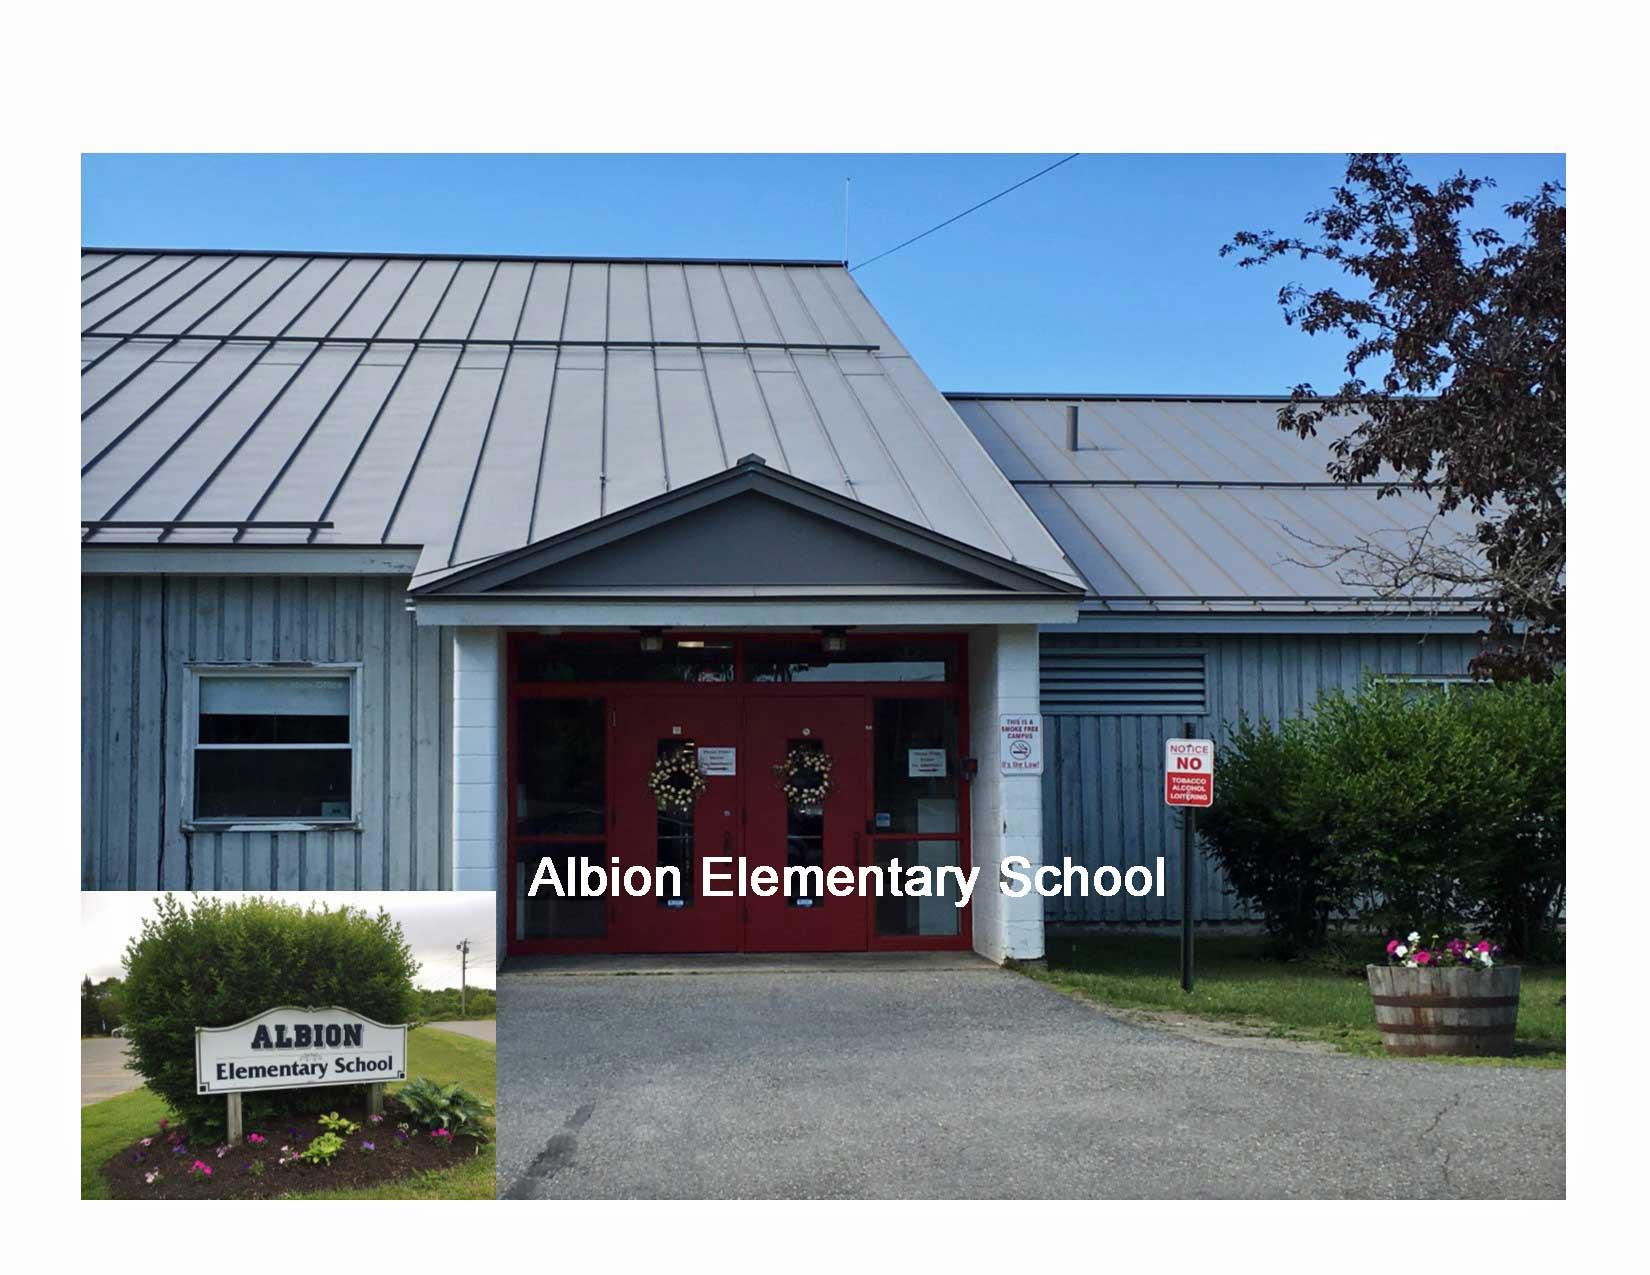 Albion Elementary School